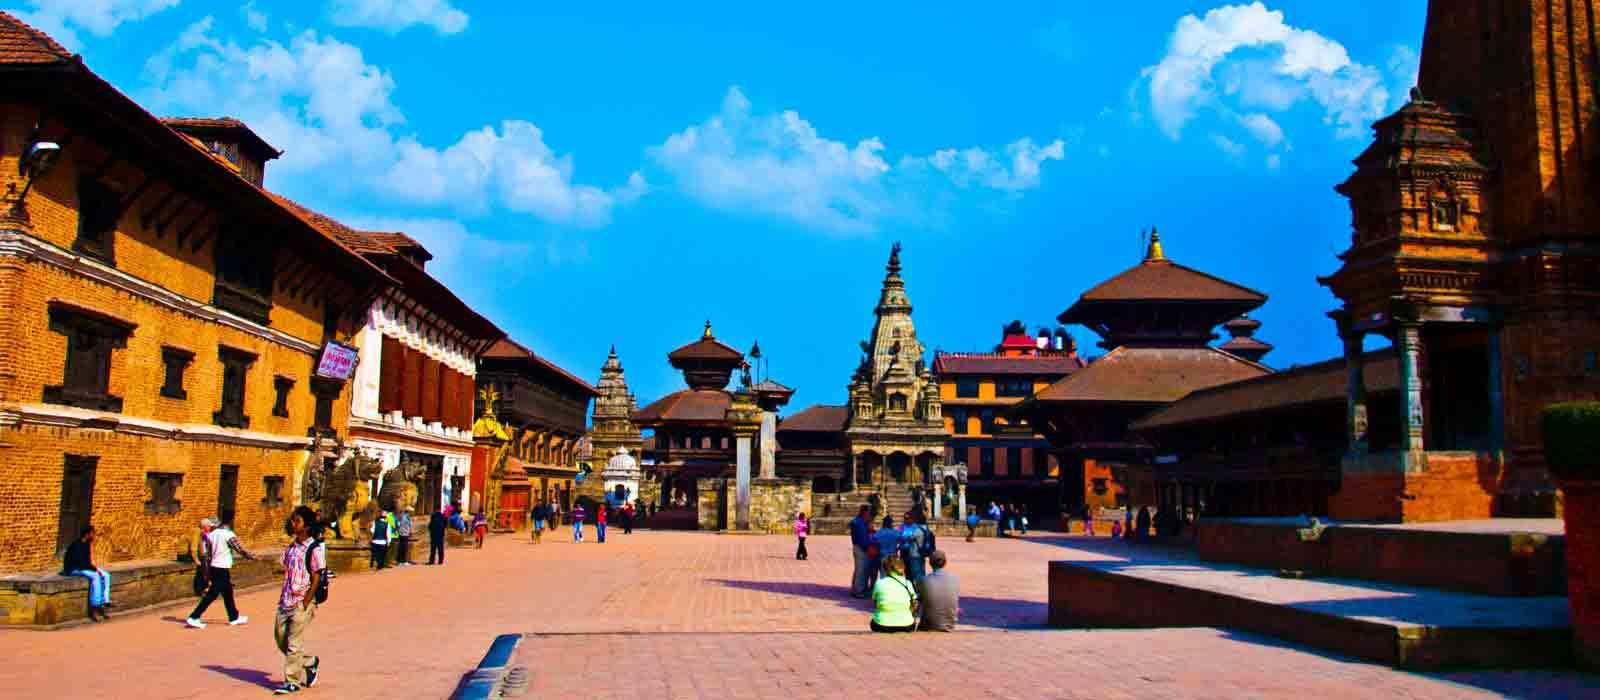 Private Tour To Nagarkot Sunrise and Bhaktapur Durbar Square